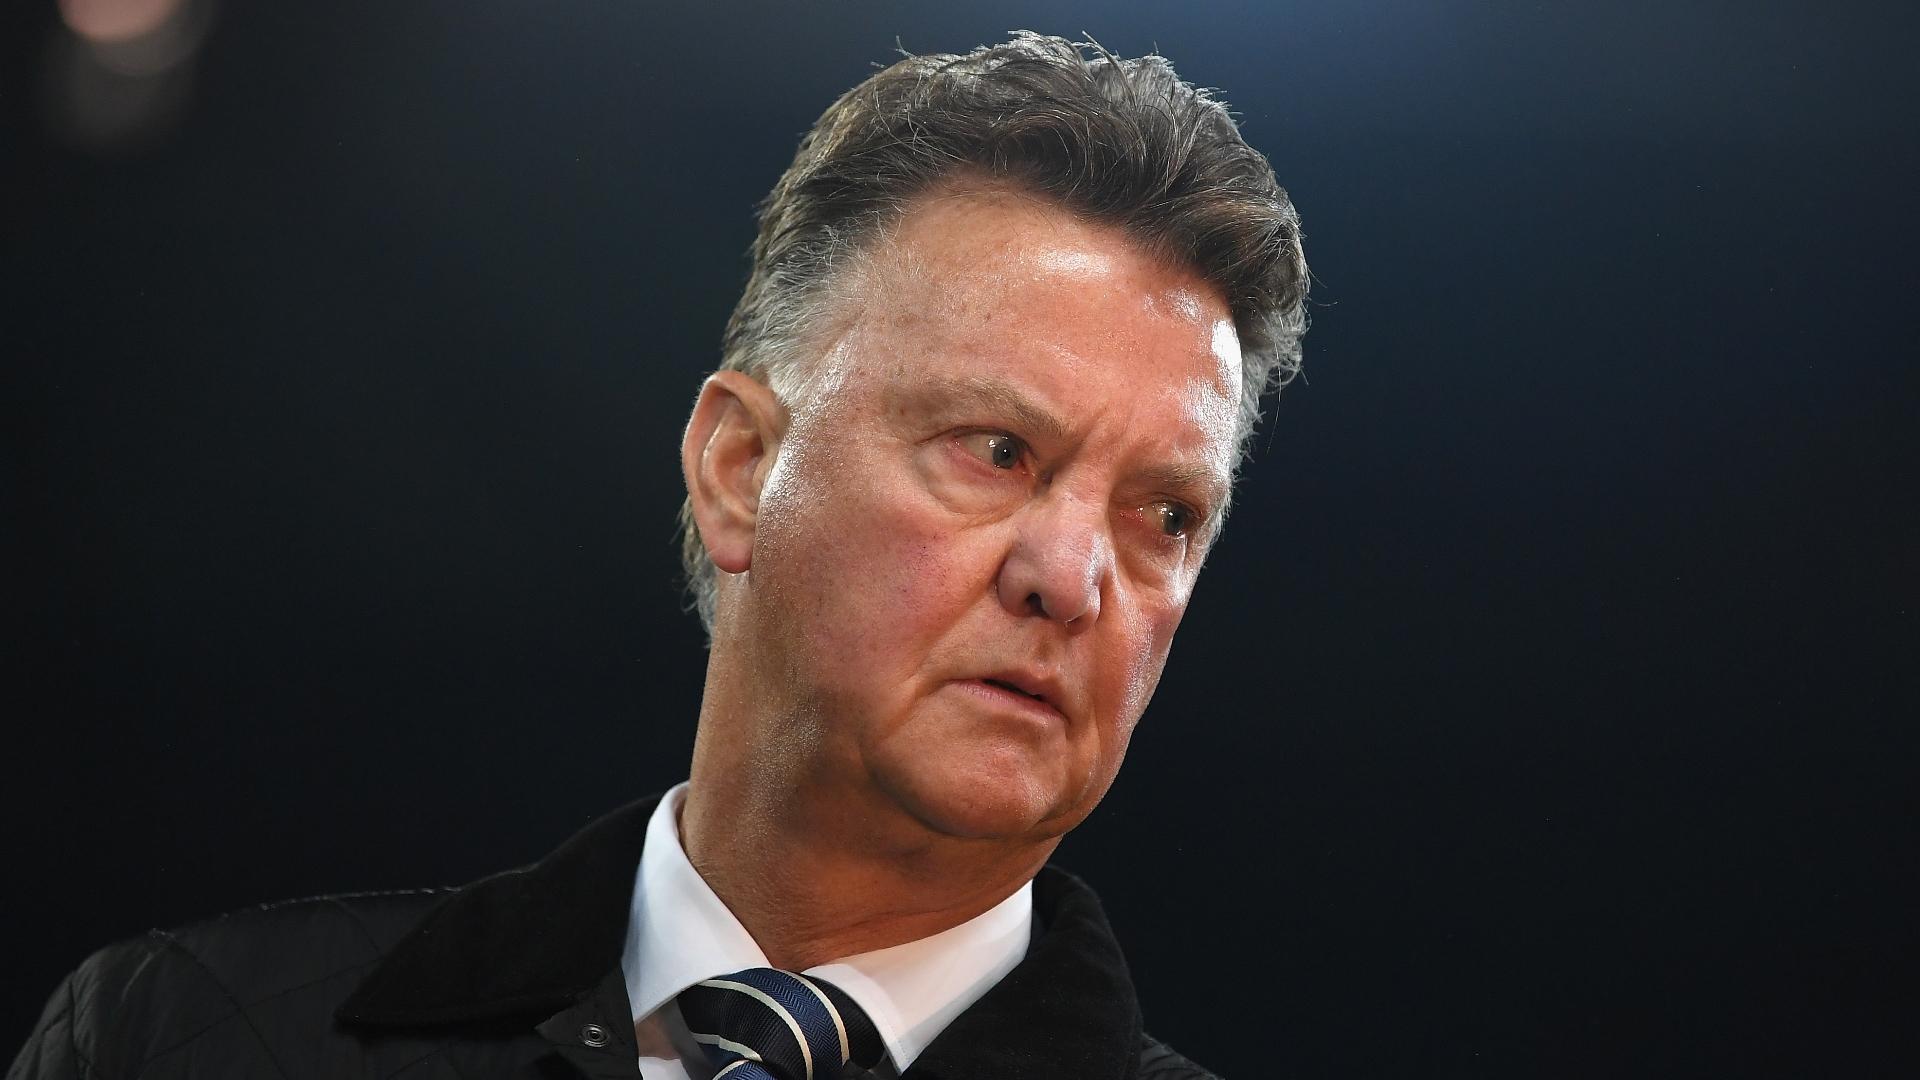 Chelsea News: 'Louis Van Gaal Should Not Talk About